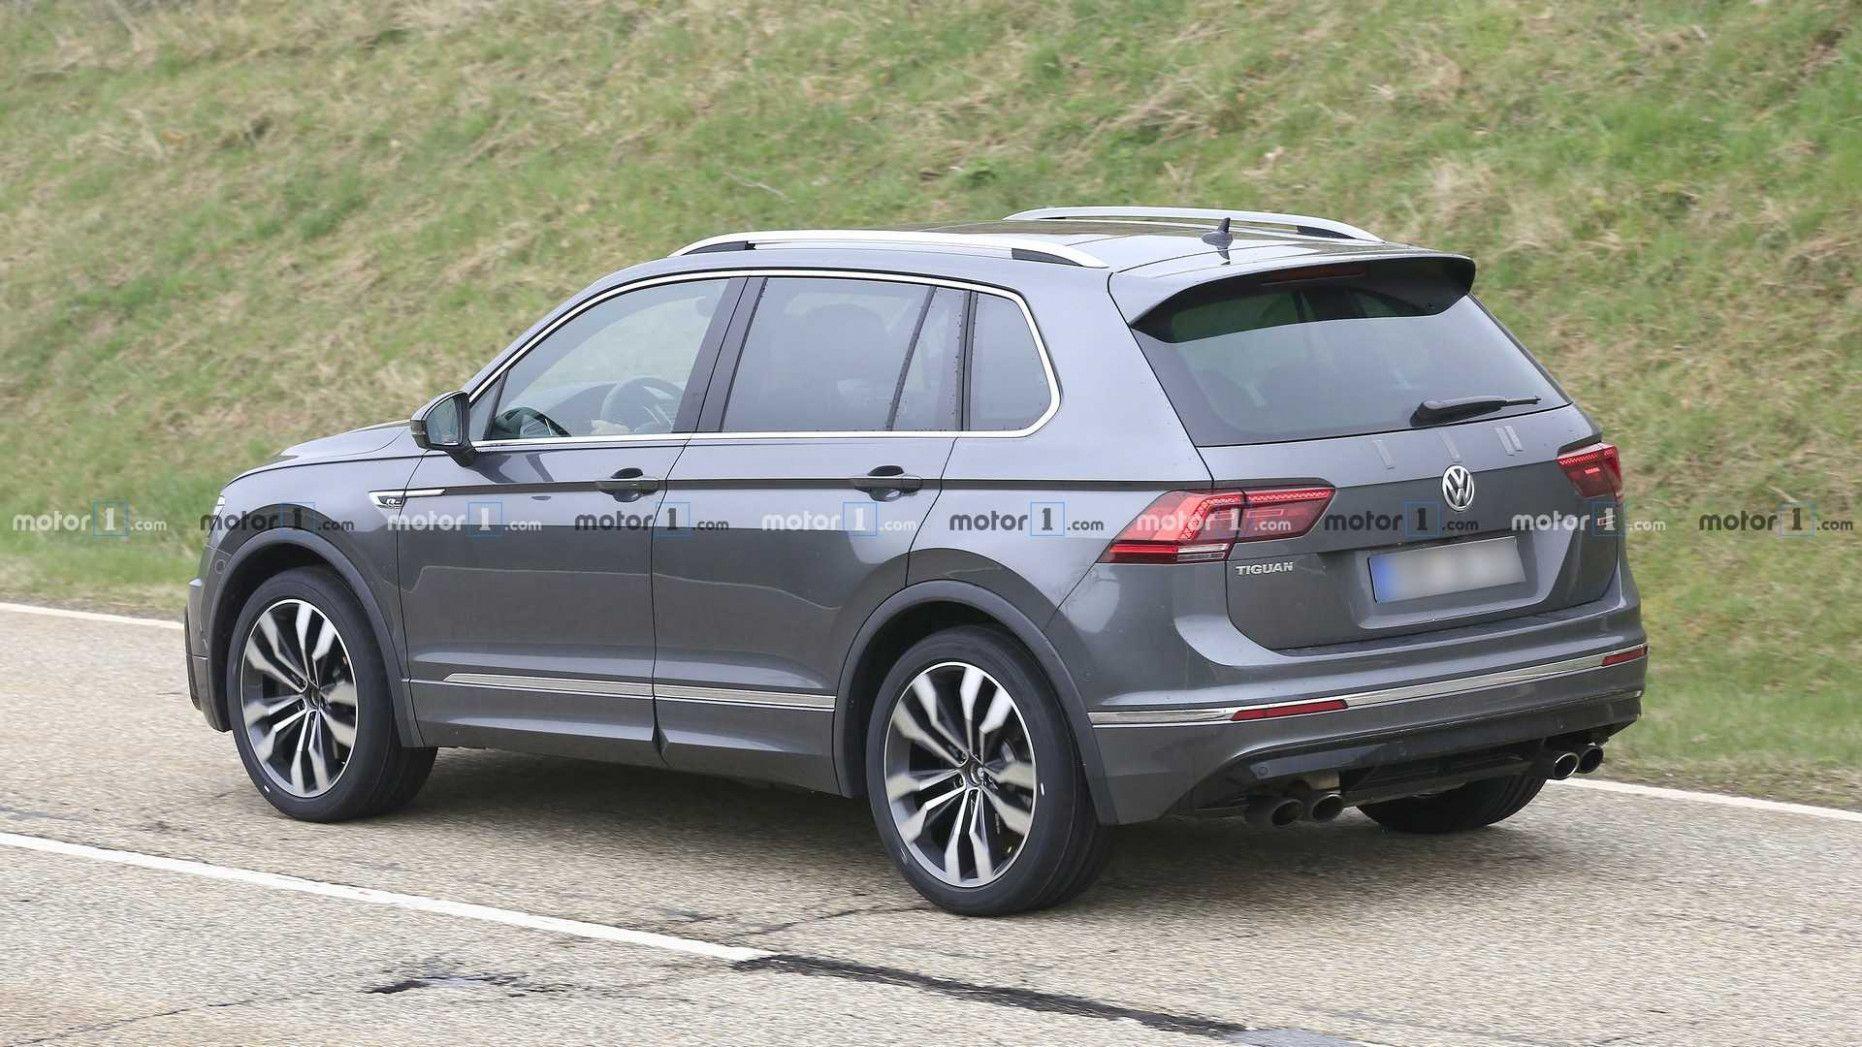 Vw Tiguan Facelift And Tiguan R Concept Due In 3 Volkswagen Tiguan Wolfsburg Edition 2020 Volkswagen Volkswagen Touareg Tiguan R